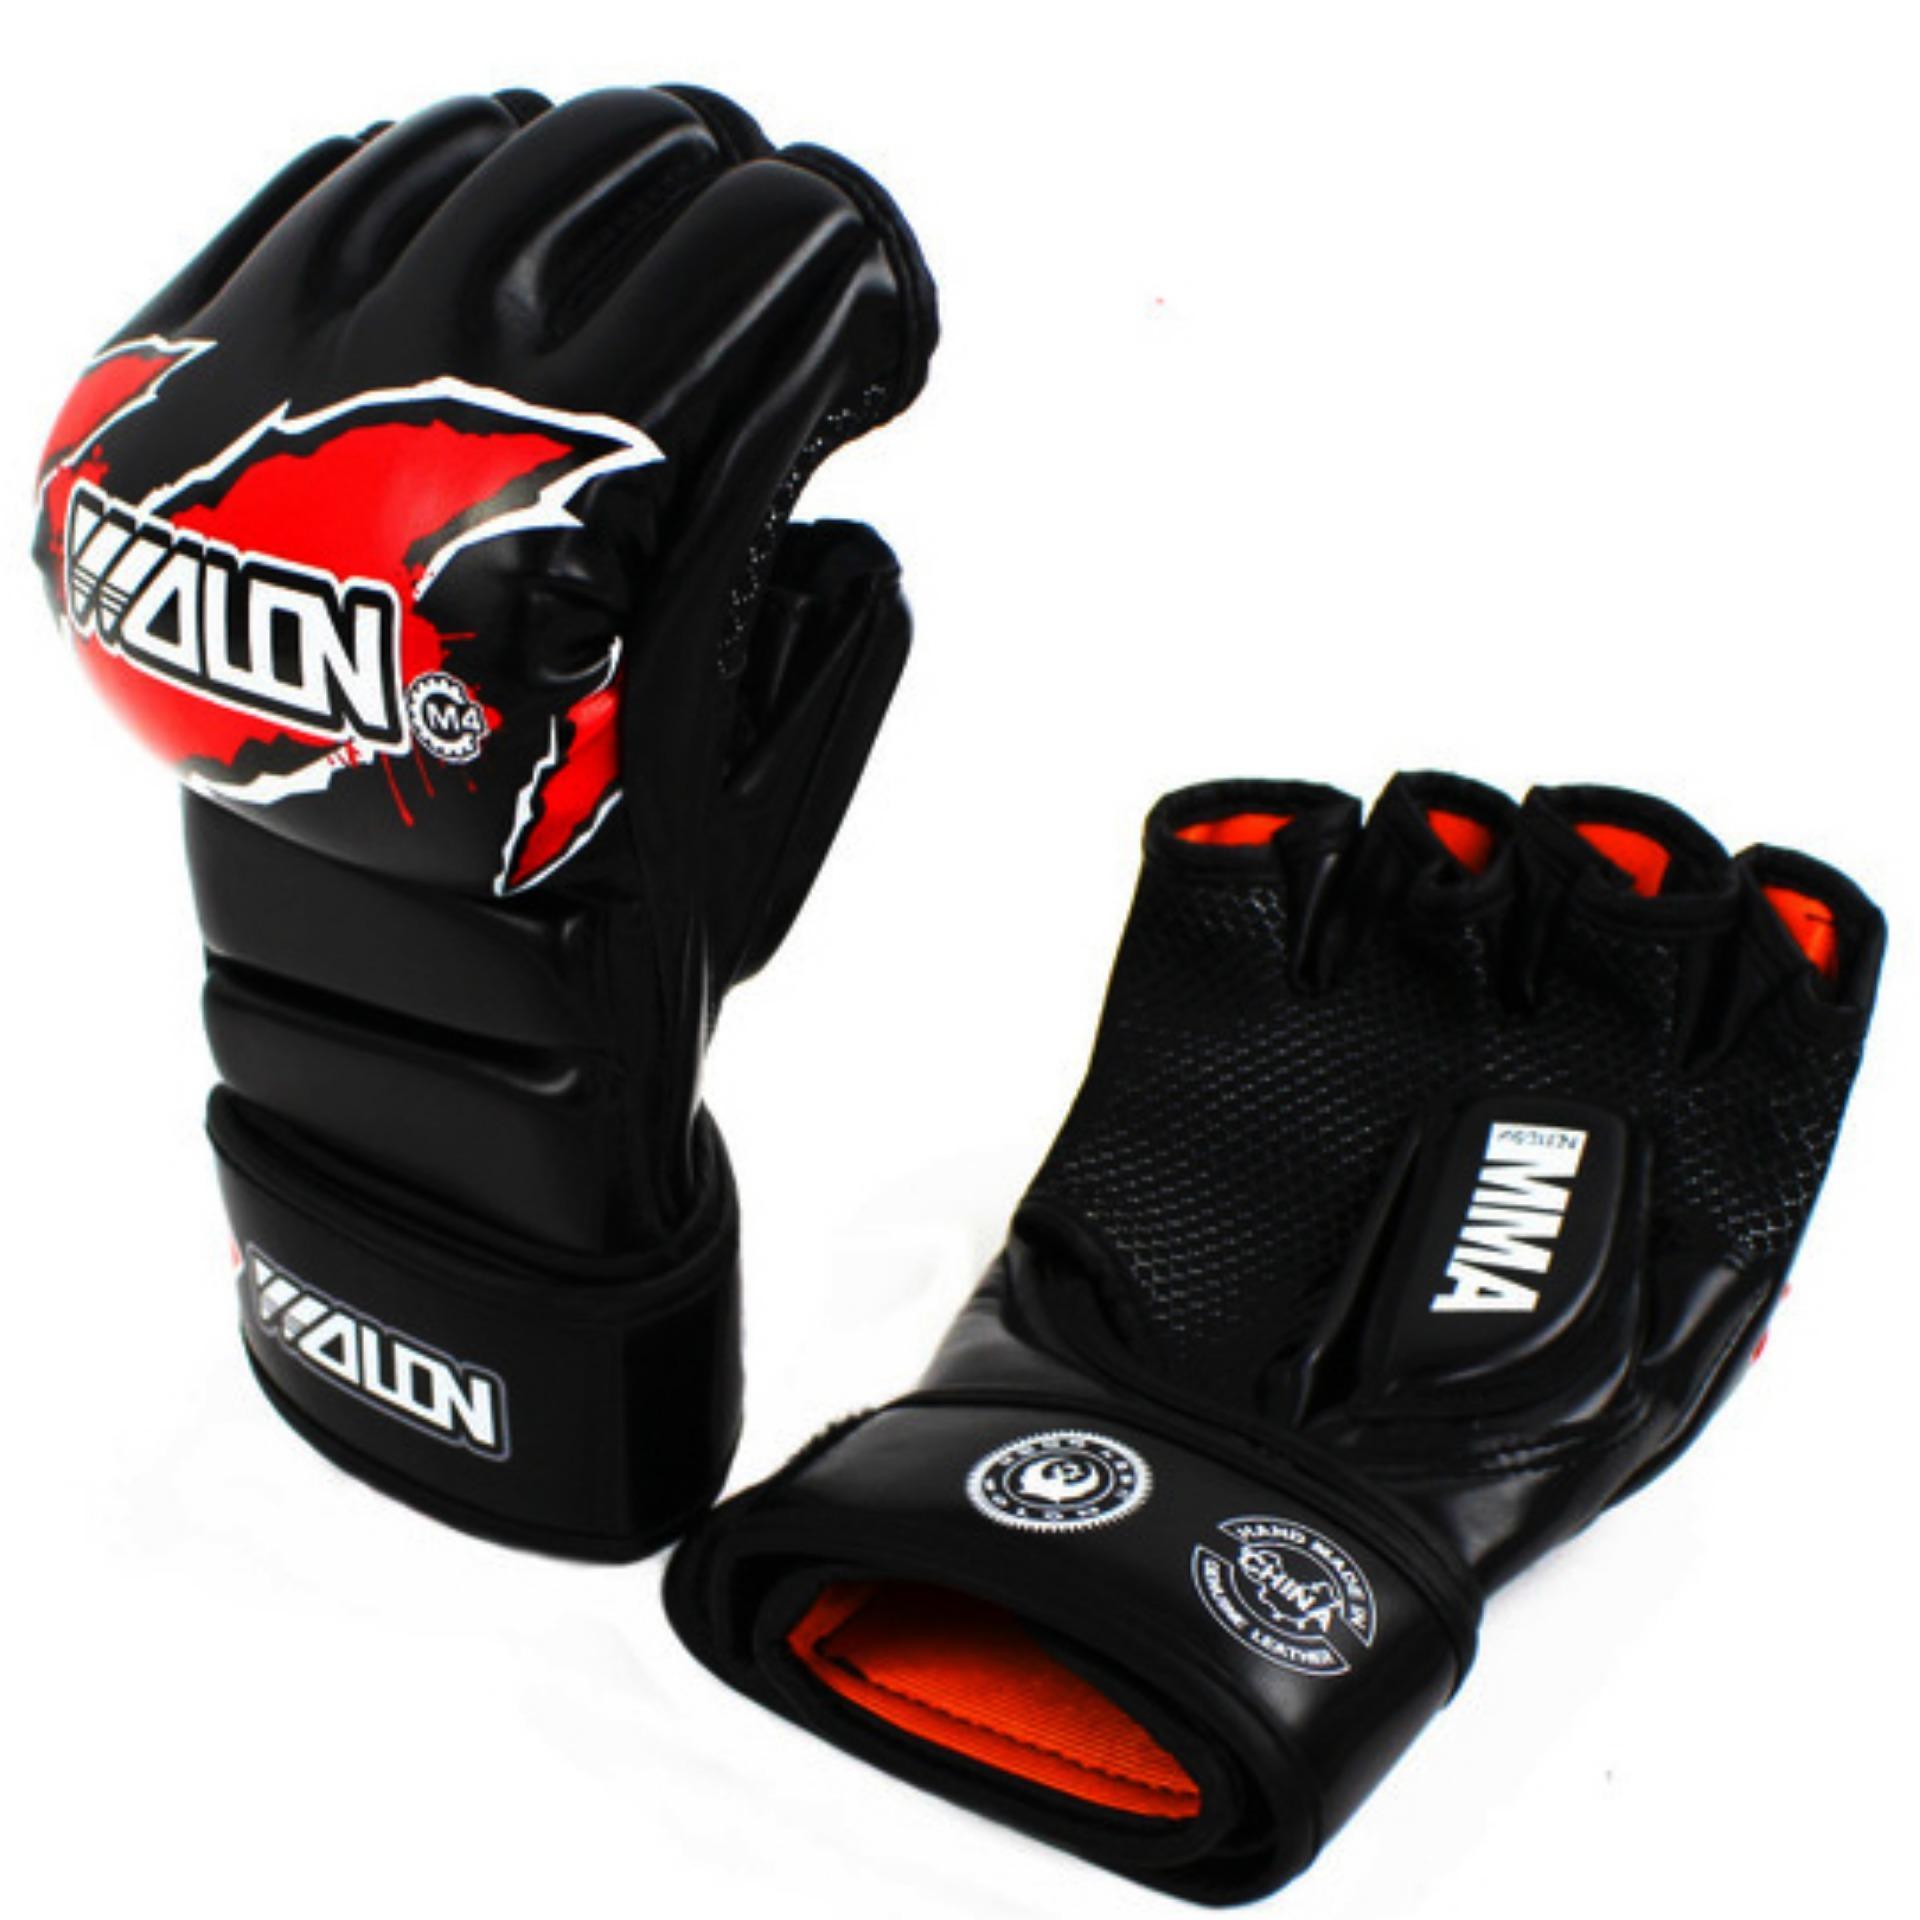 Găng Tay MMA Wolon Fighter Gloves